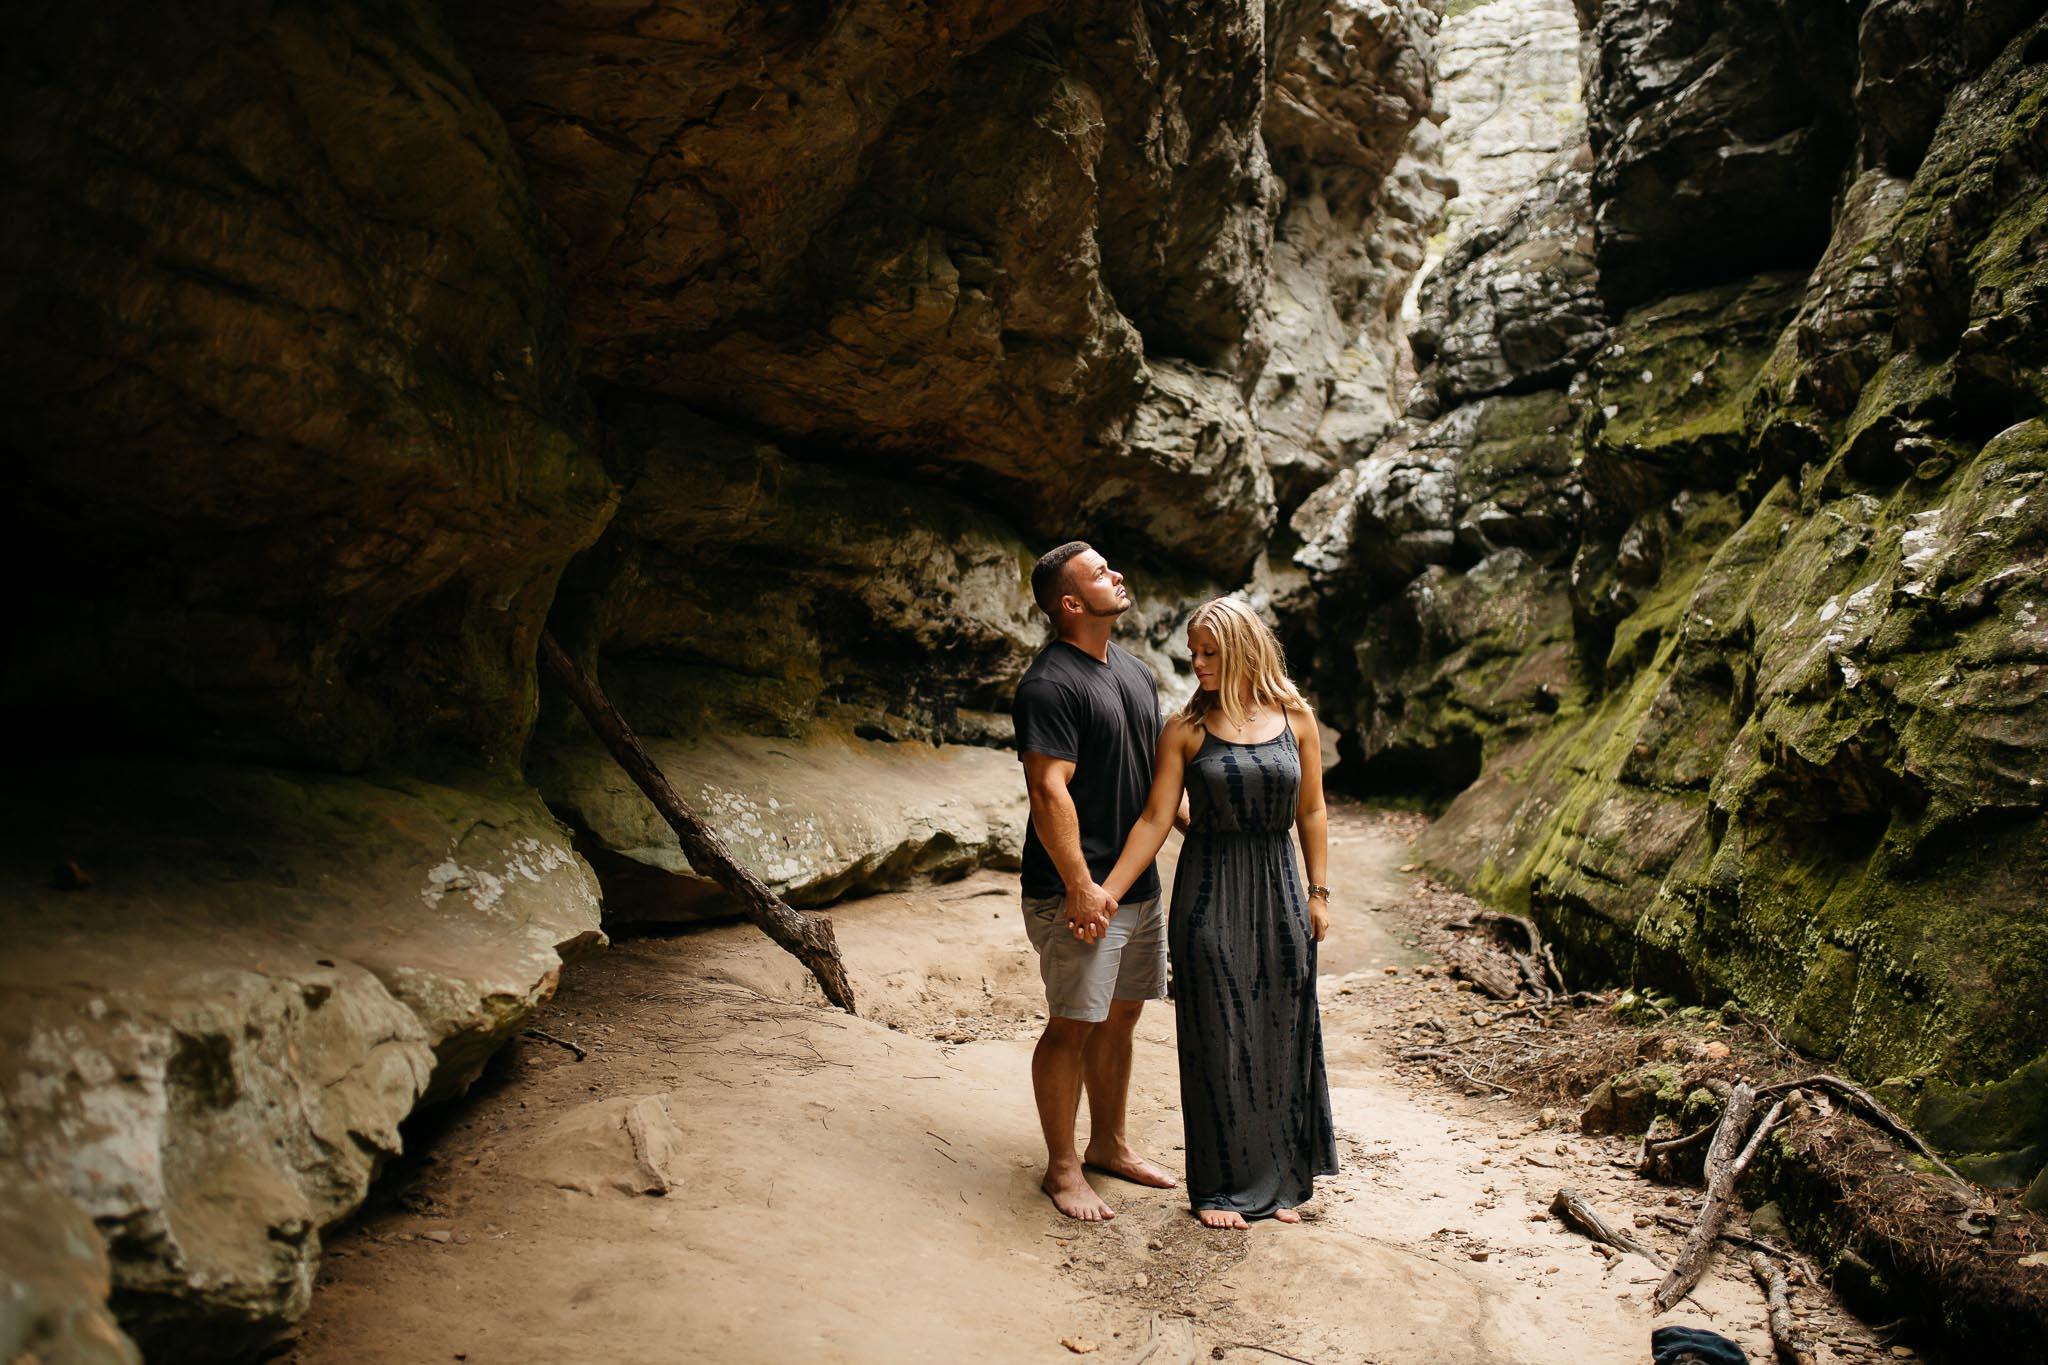 The Hatches | Petit Jean State Park | Waterfall Engagement Session | Destination Wedding Photographers | petit-jean-state-park-engagement-session-moody-romantic-unique-adventurous-wedding-photographer